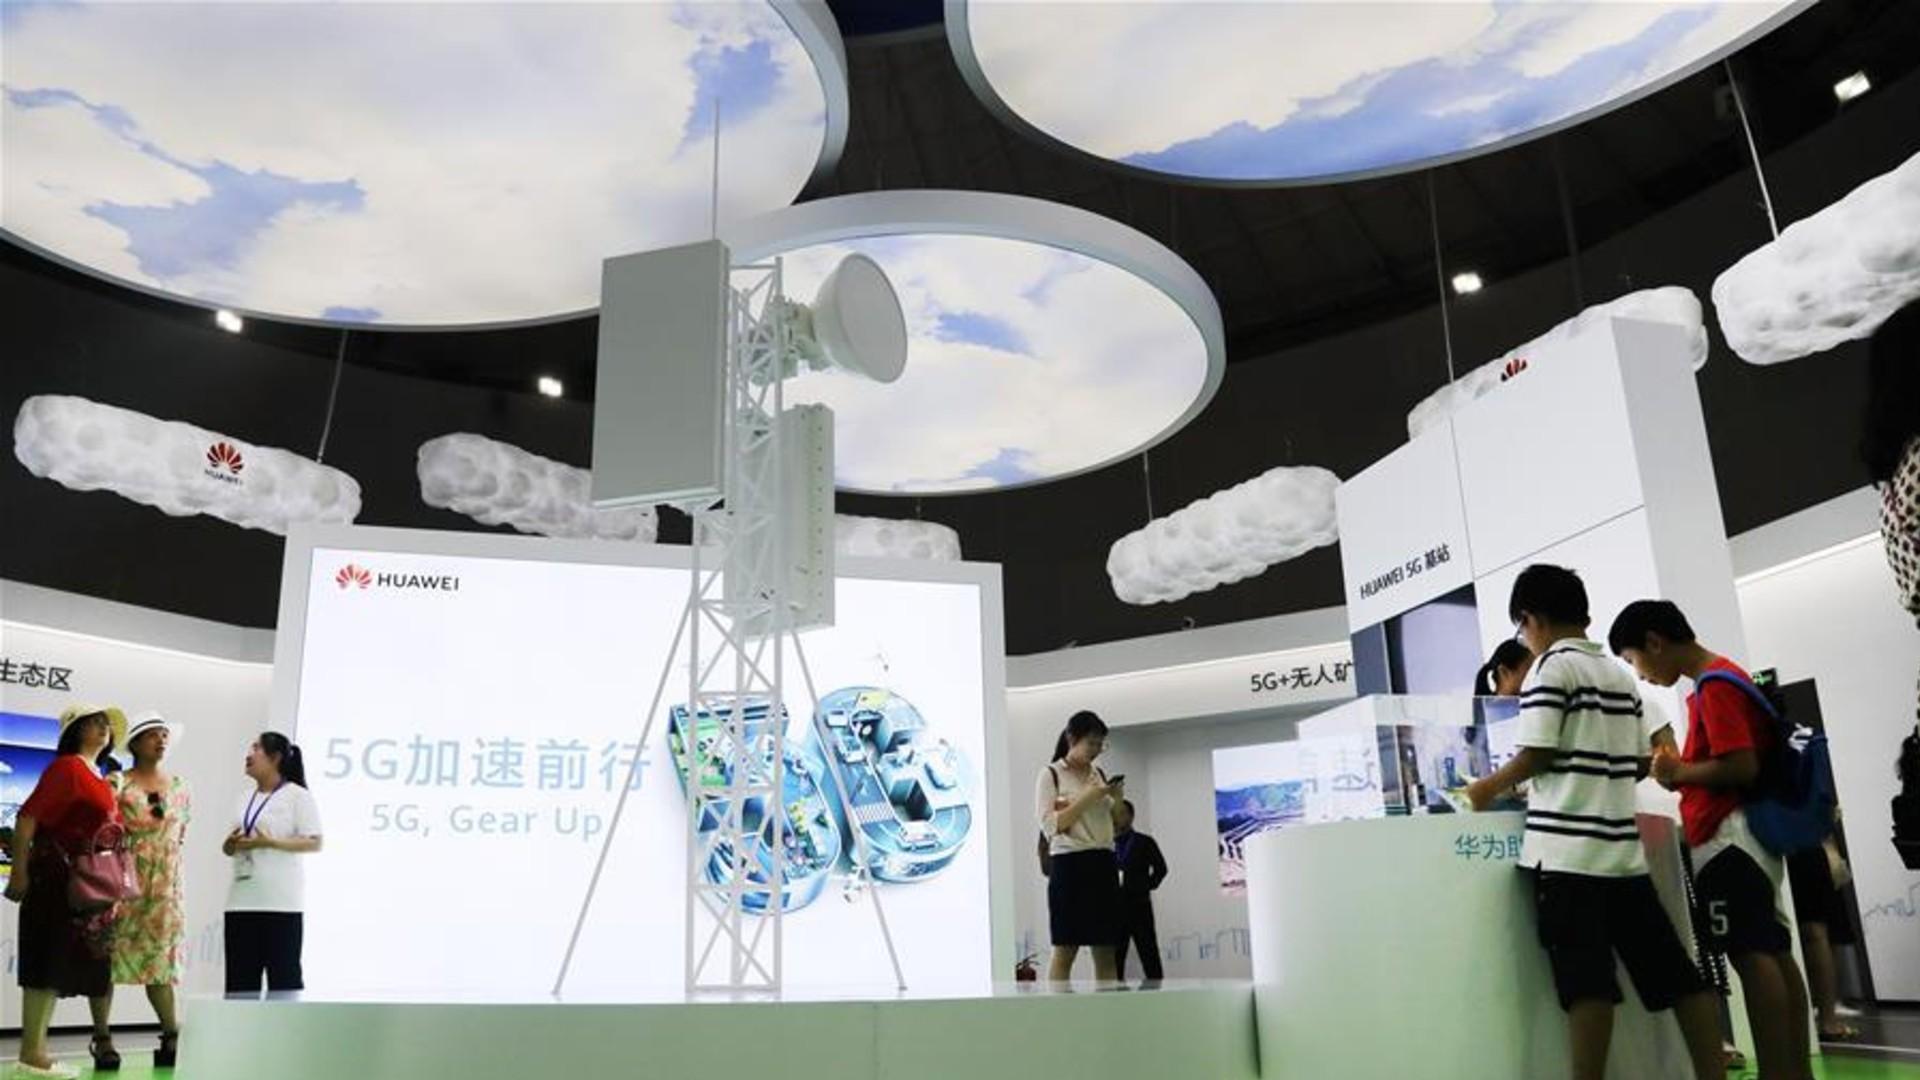 Inicia en China Conferencia Mundial de Inteligencia Artificial 2019